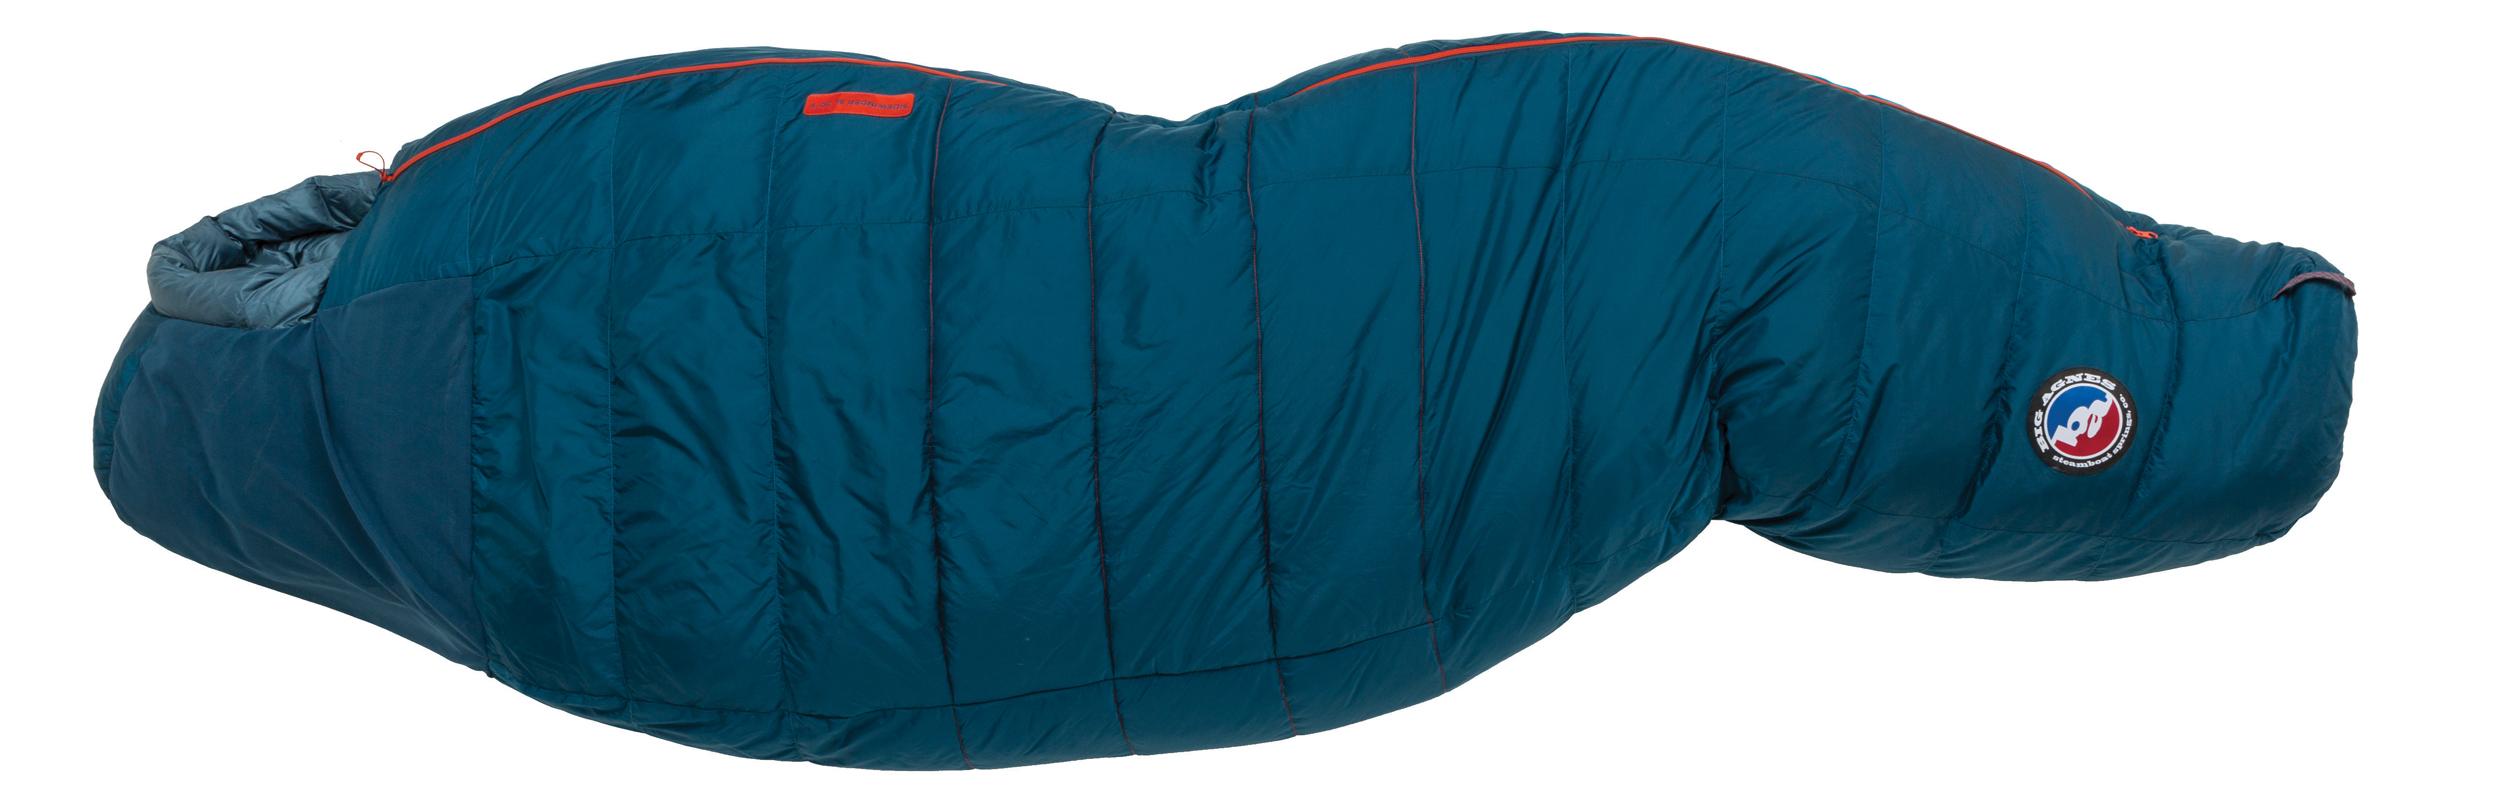 Big Agnes Sidewinder SL sleeping bag